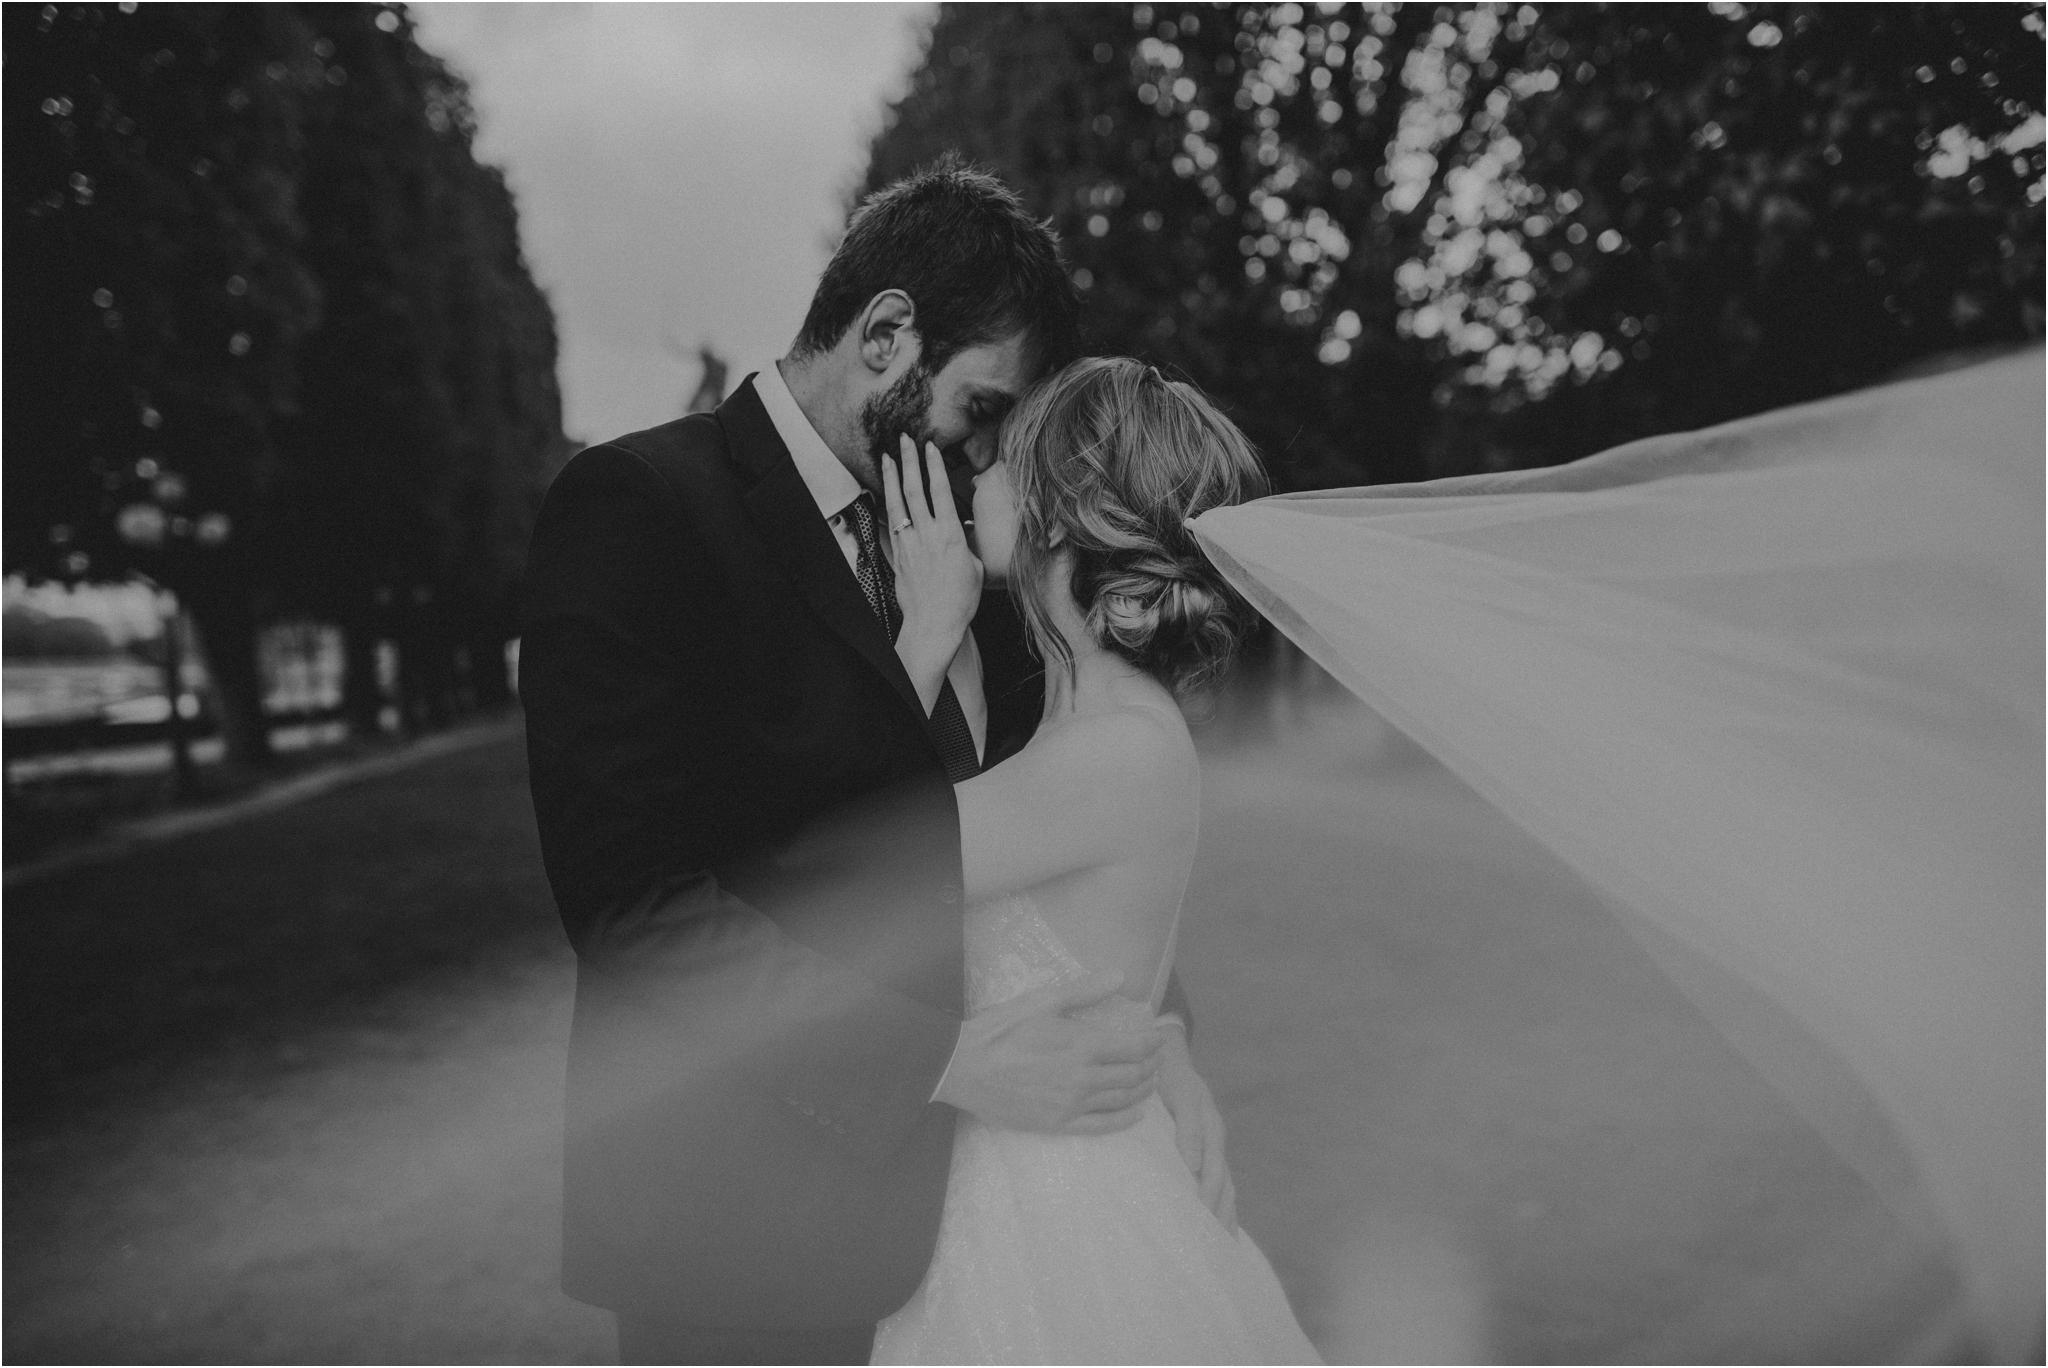 miranda-and-jared-paris-elopement-destination-wedding-photographer-048.jpg